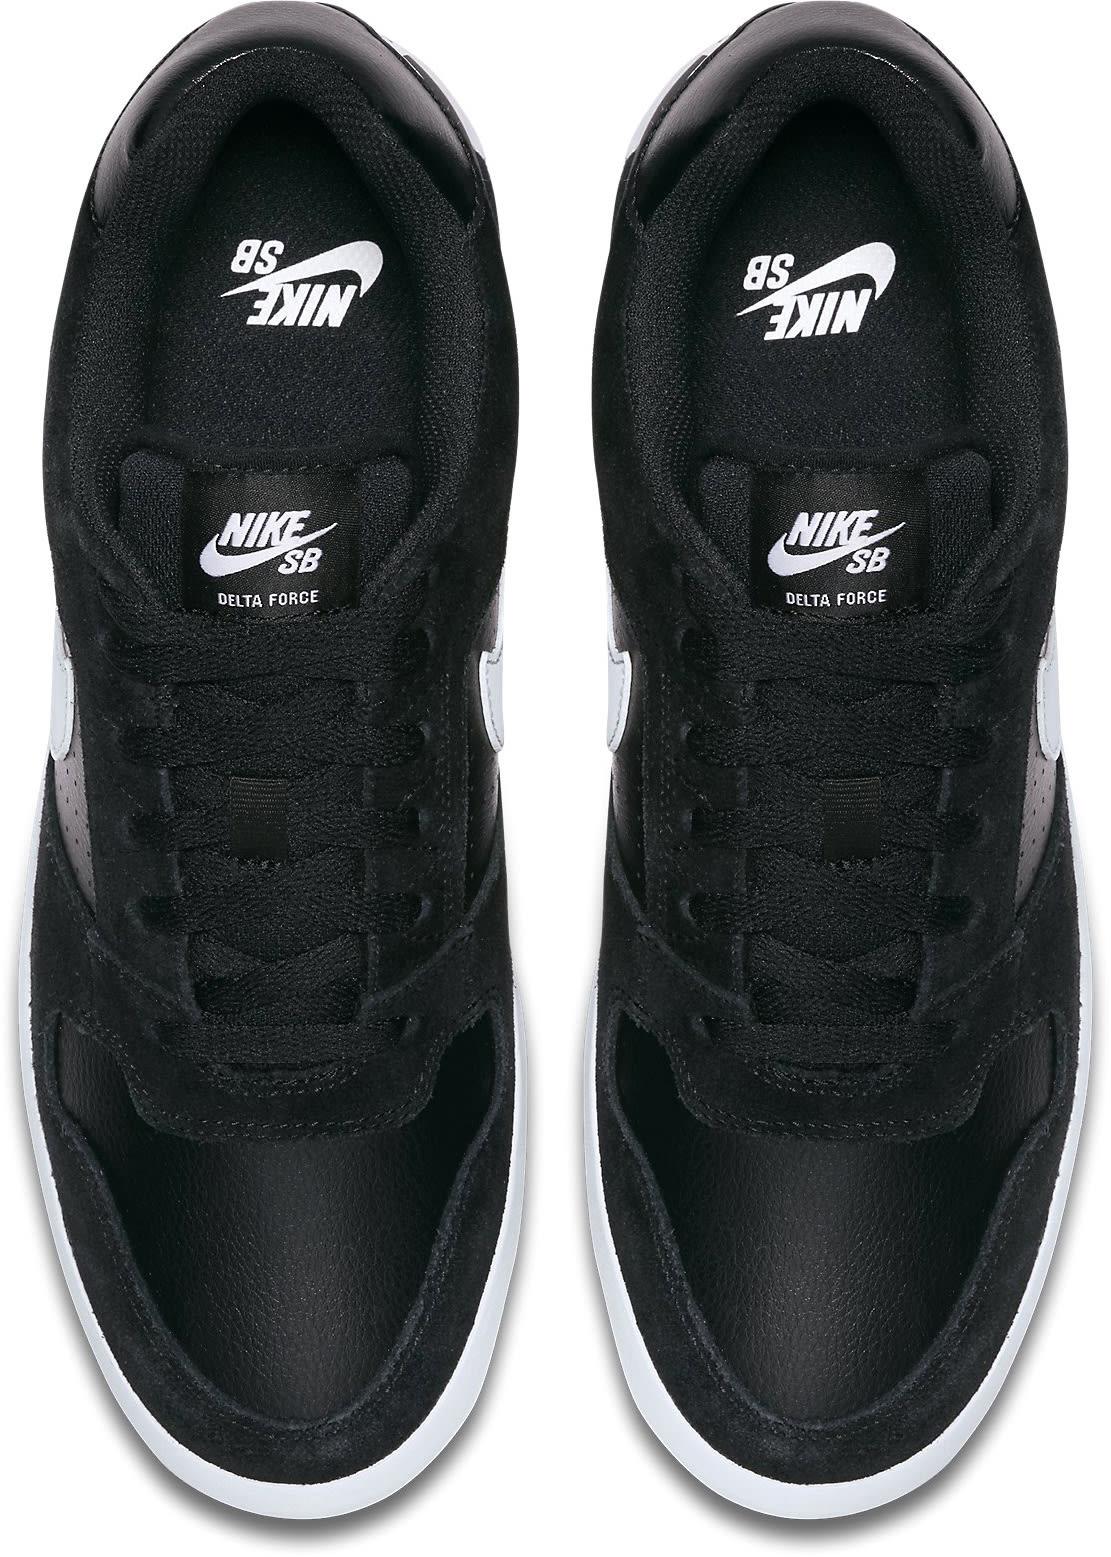 cheaper 63ab5 a189c Nike SB Delta Force Vulc Skate Shoes - thumbnail 5